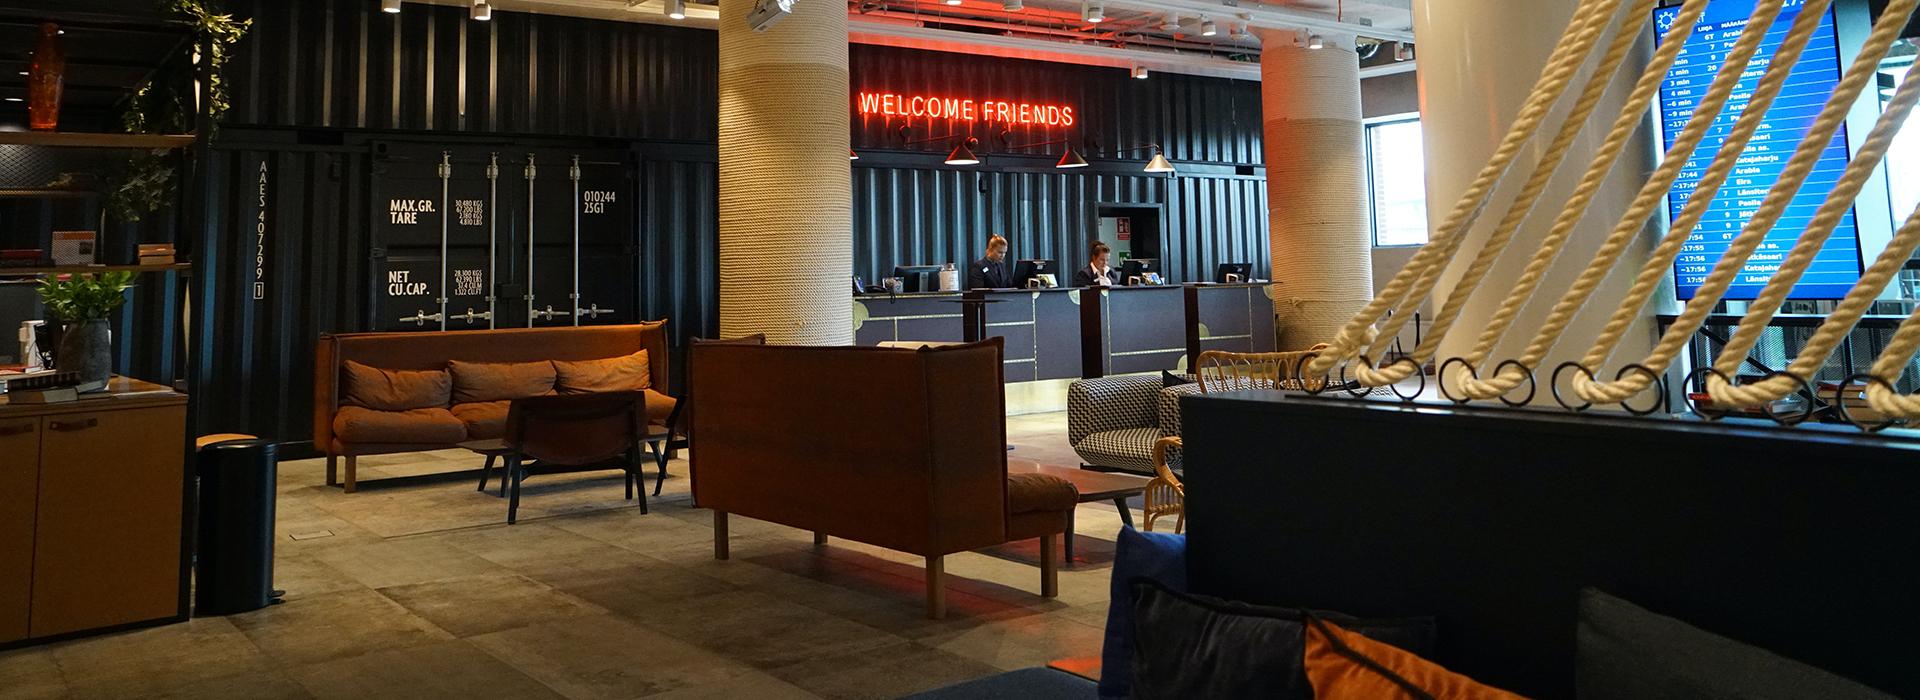 lounge at Radisson Blu Hotel in Helsinki, Finland